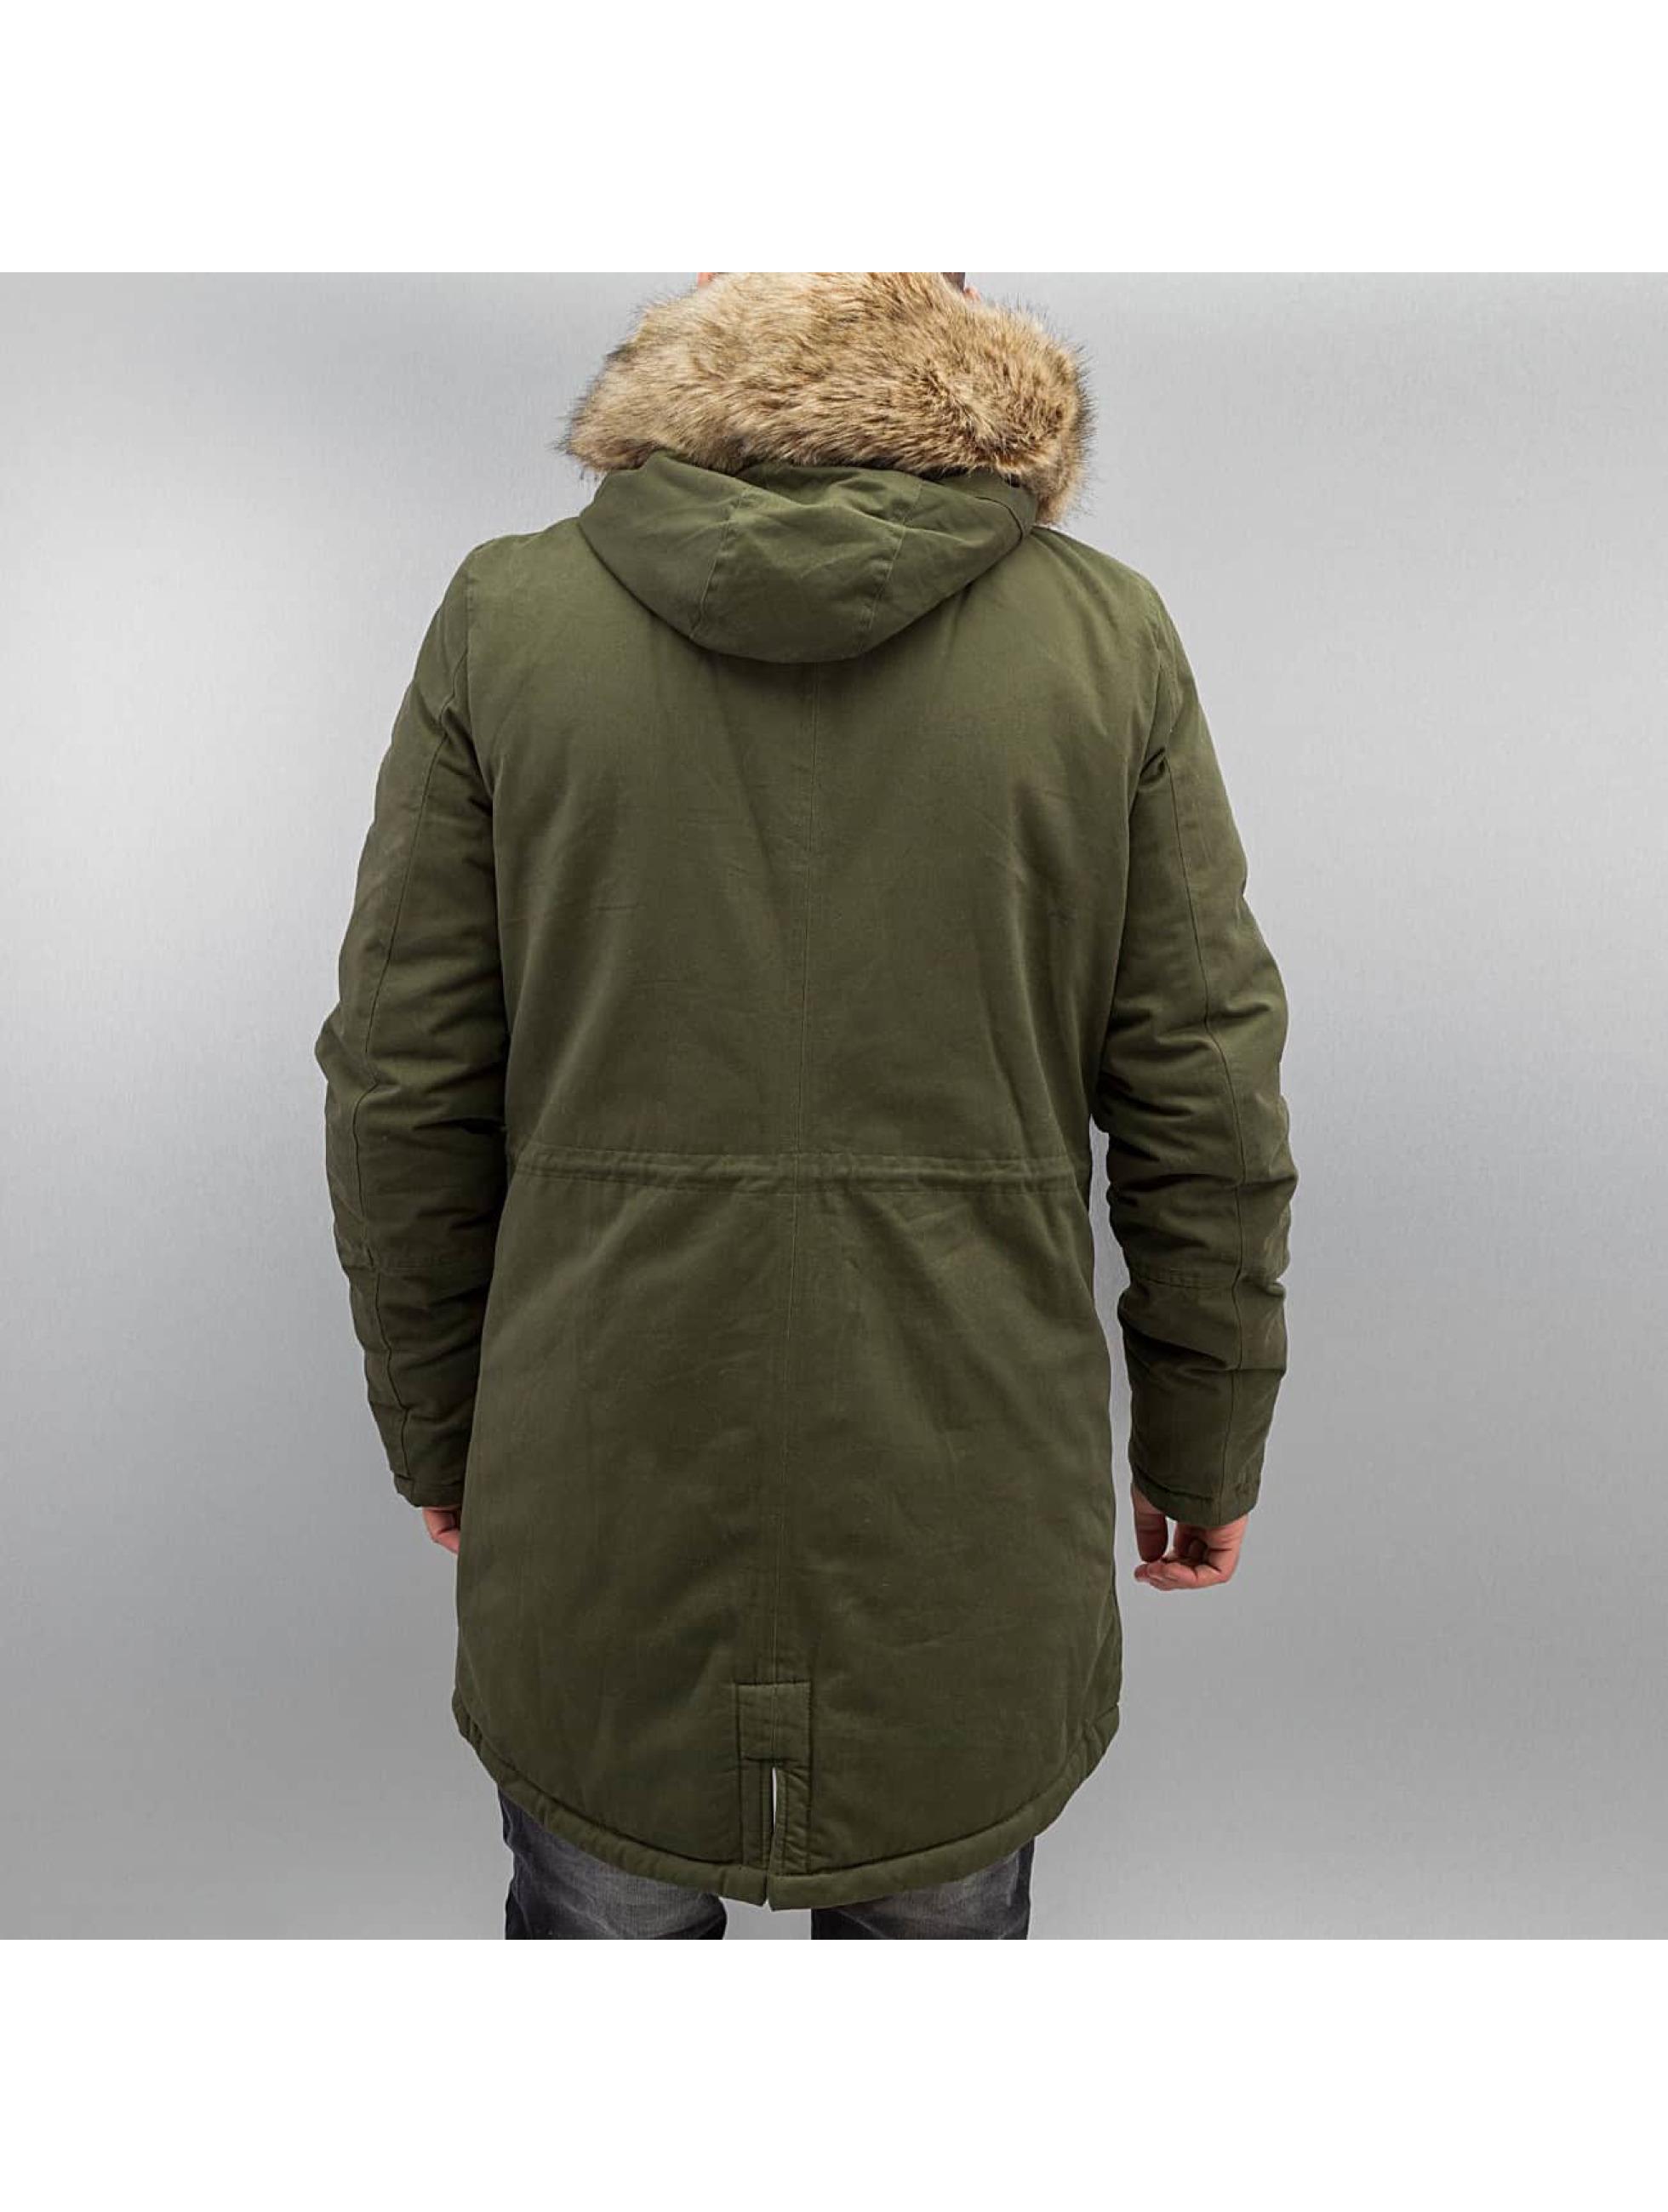 sixth june herren winterjacke fur in khaki 301461. Black Bedroom Furniture Sets. Home Design Ideas